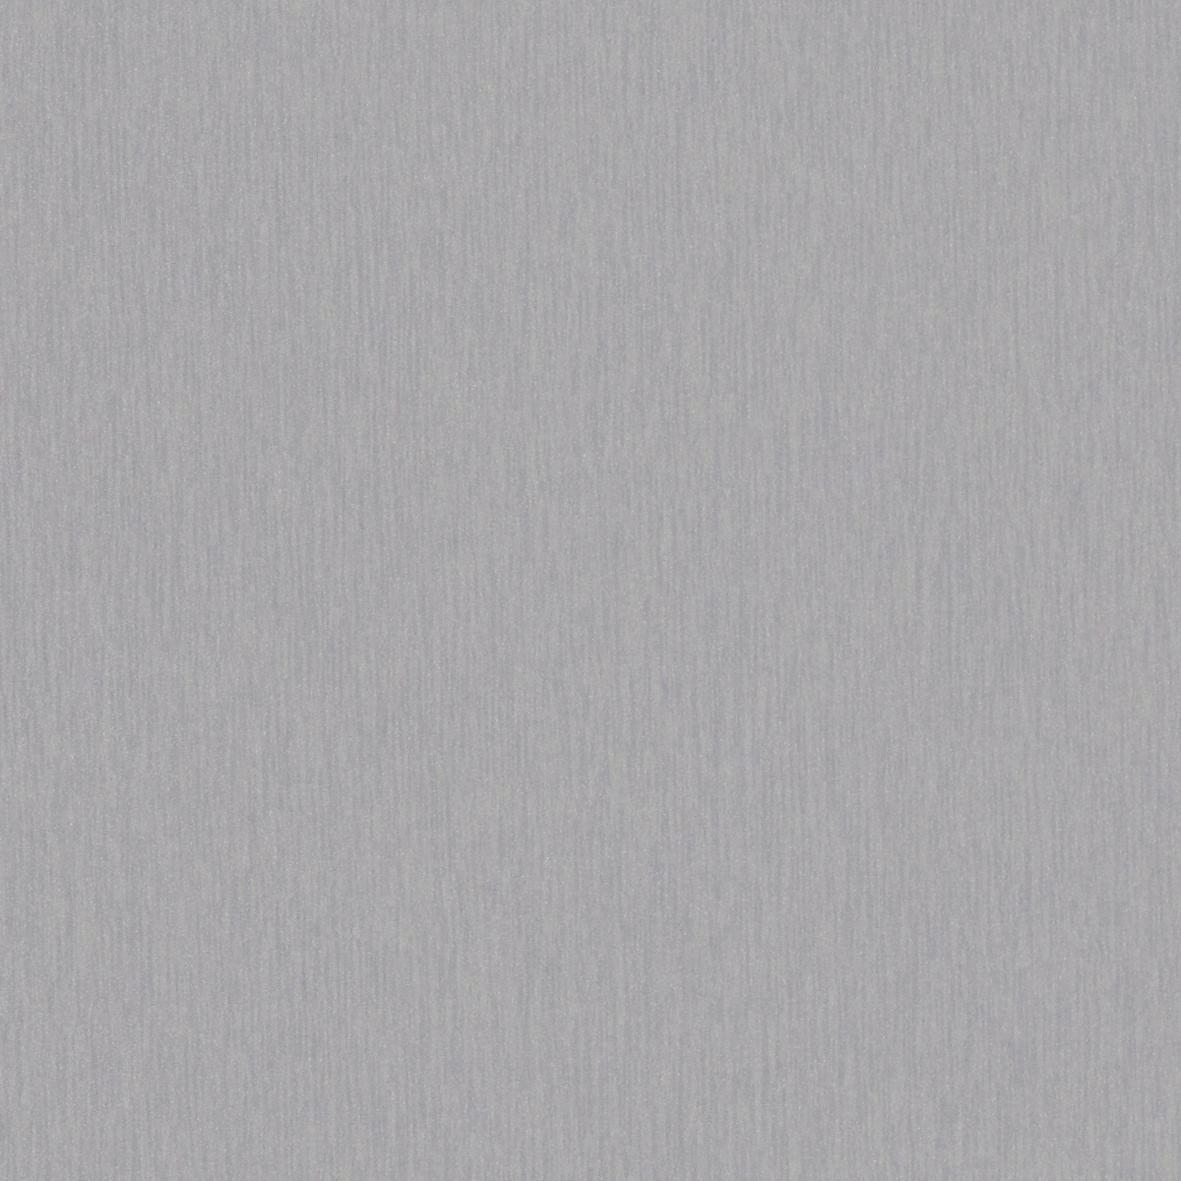 Plan De Travail Laminé plan de travail stratifié aluminium f8110 vv 4100x650x38mm profil quadra